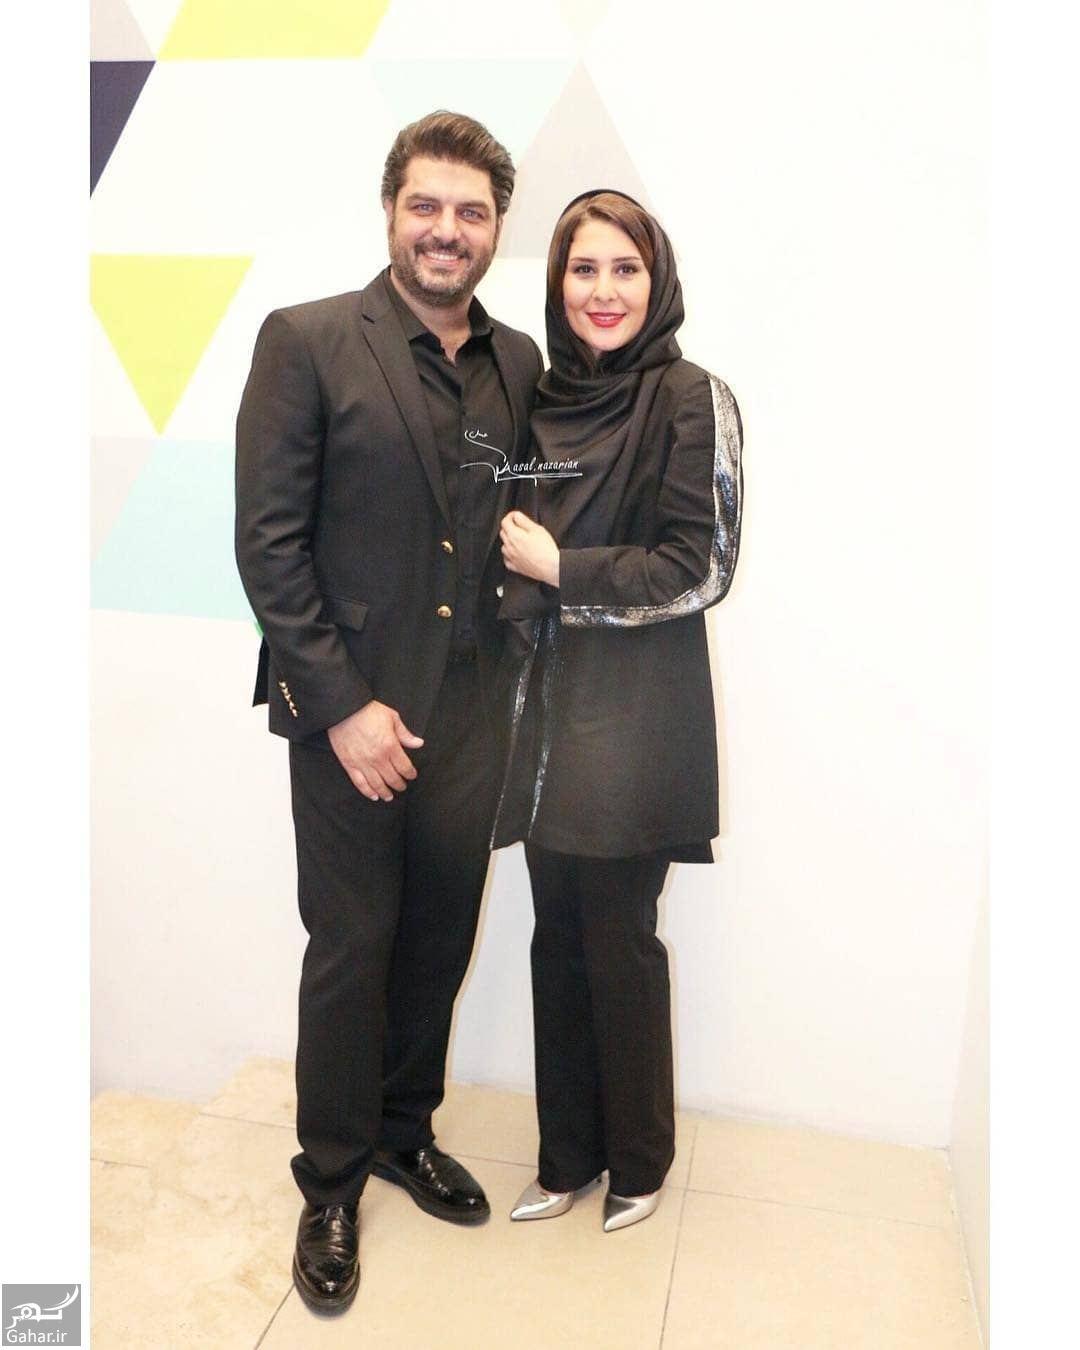 697564 Gahar ir عکس های جدید سام درخشانی و همسرش در اکران خصوصی  دشمن زن